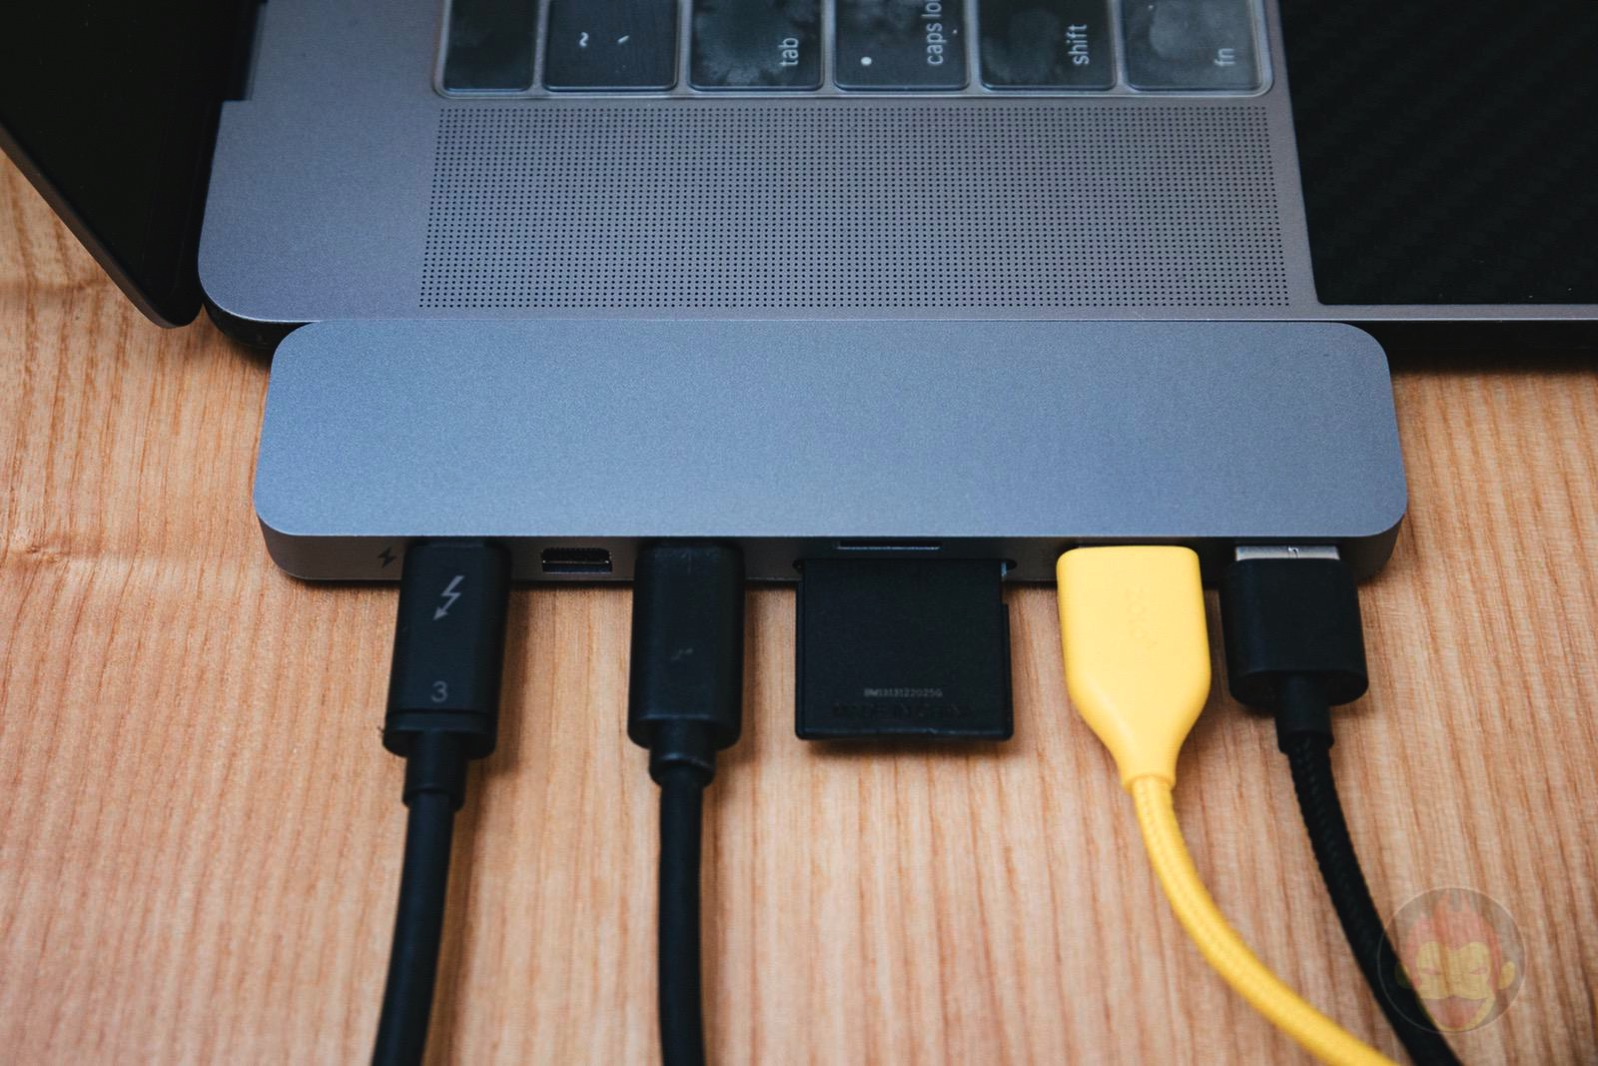 HyperDrive-PRO-USBC-Hub-06.jpg